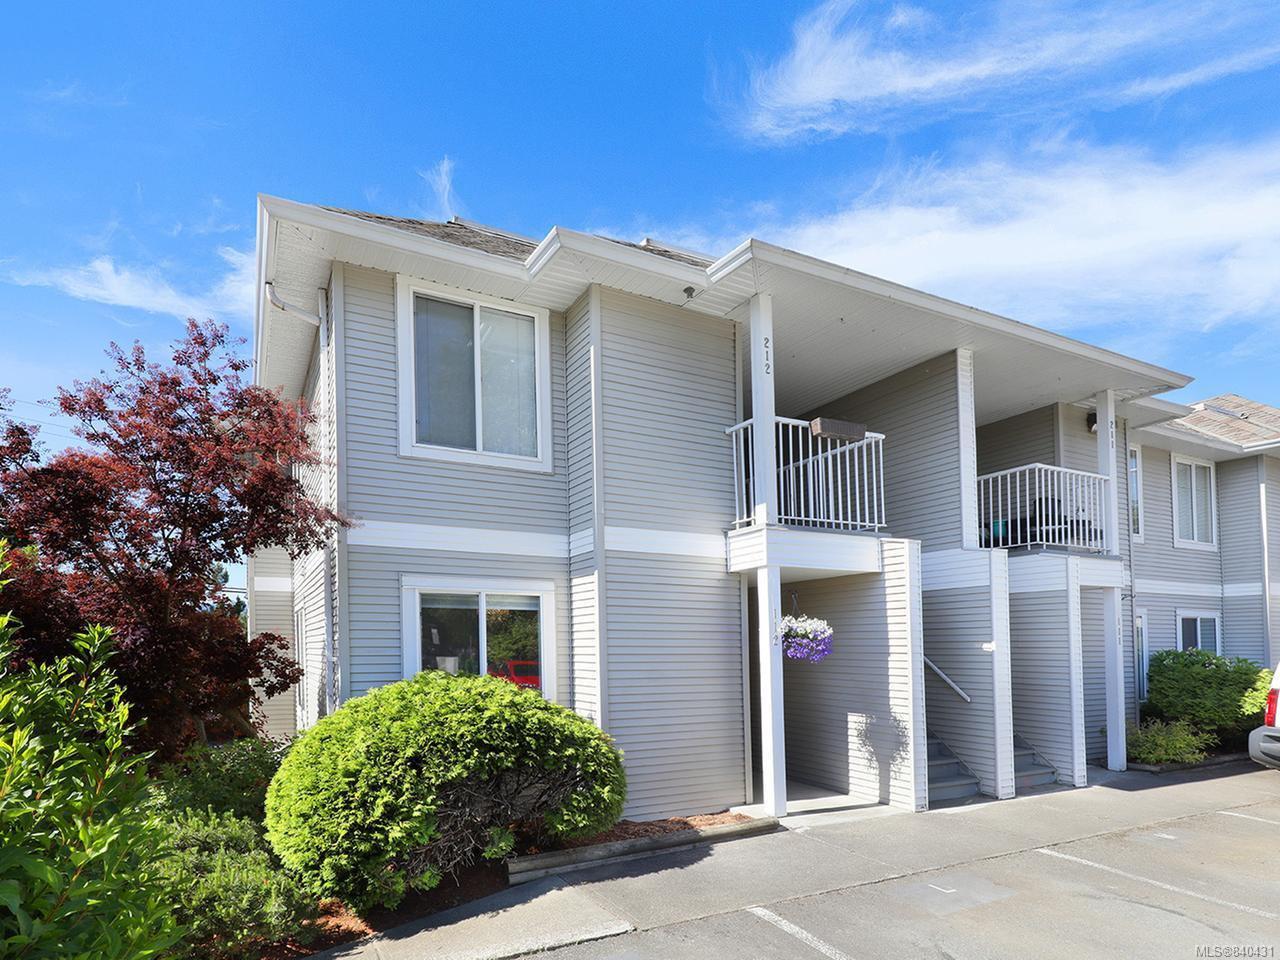 Main Photo: 112 130 BACK ROAD in COURTENAY: CV Courtenay East Condo Apartment for sale (Comox Valley)  : MLS®# 840431